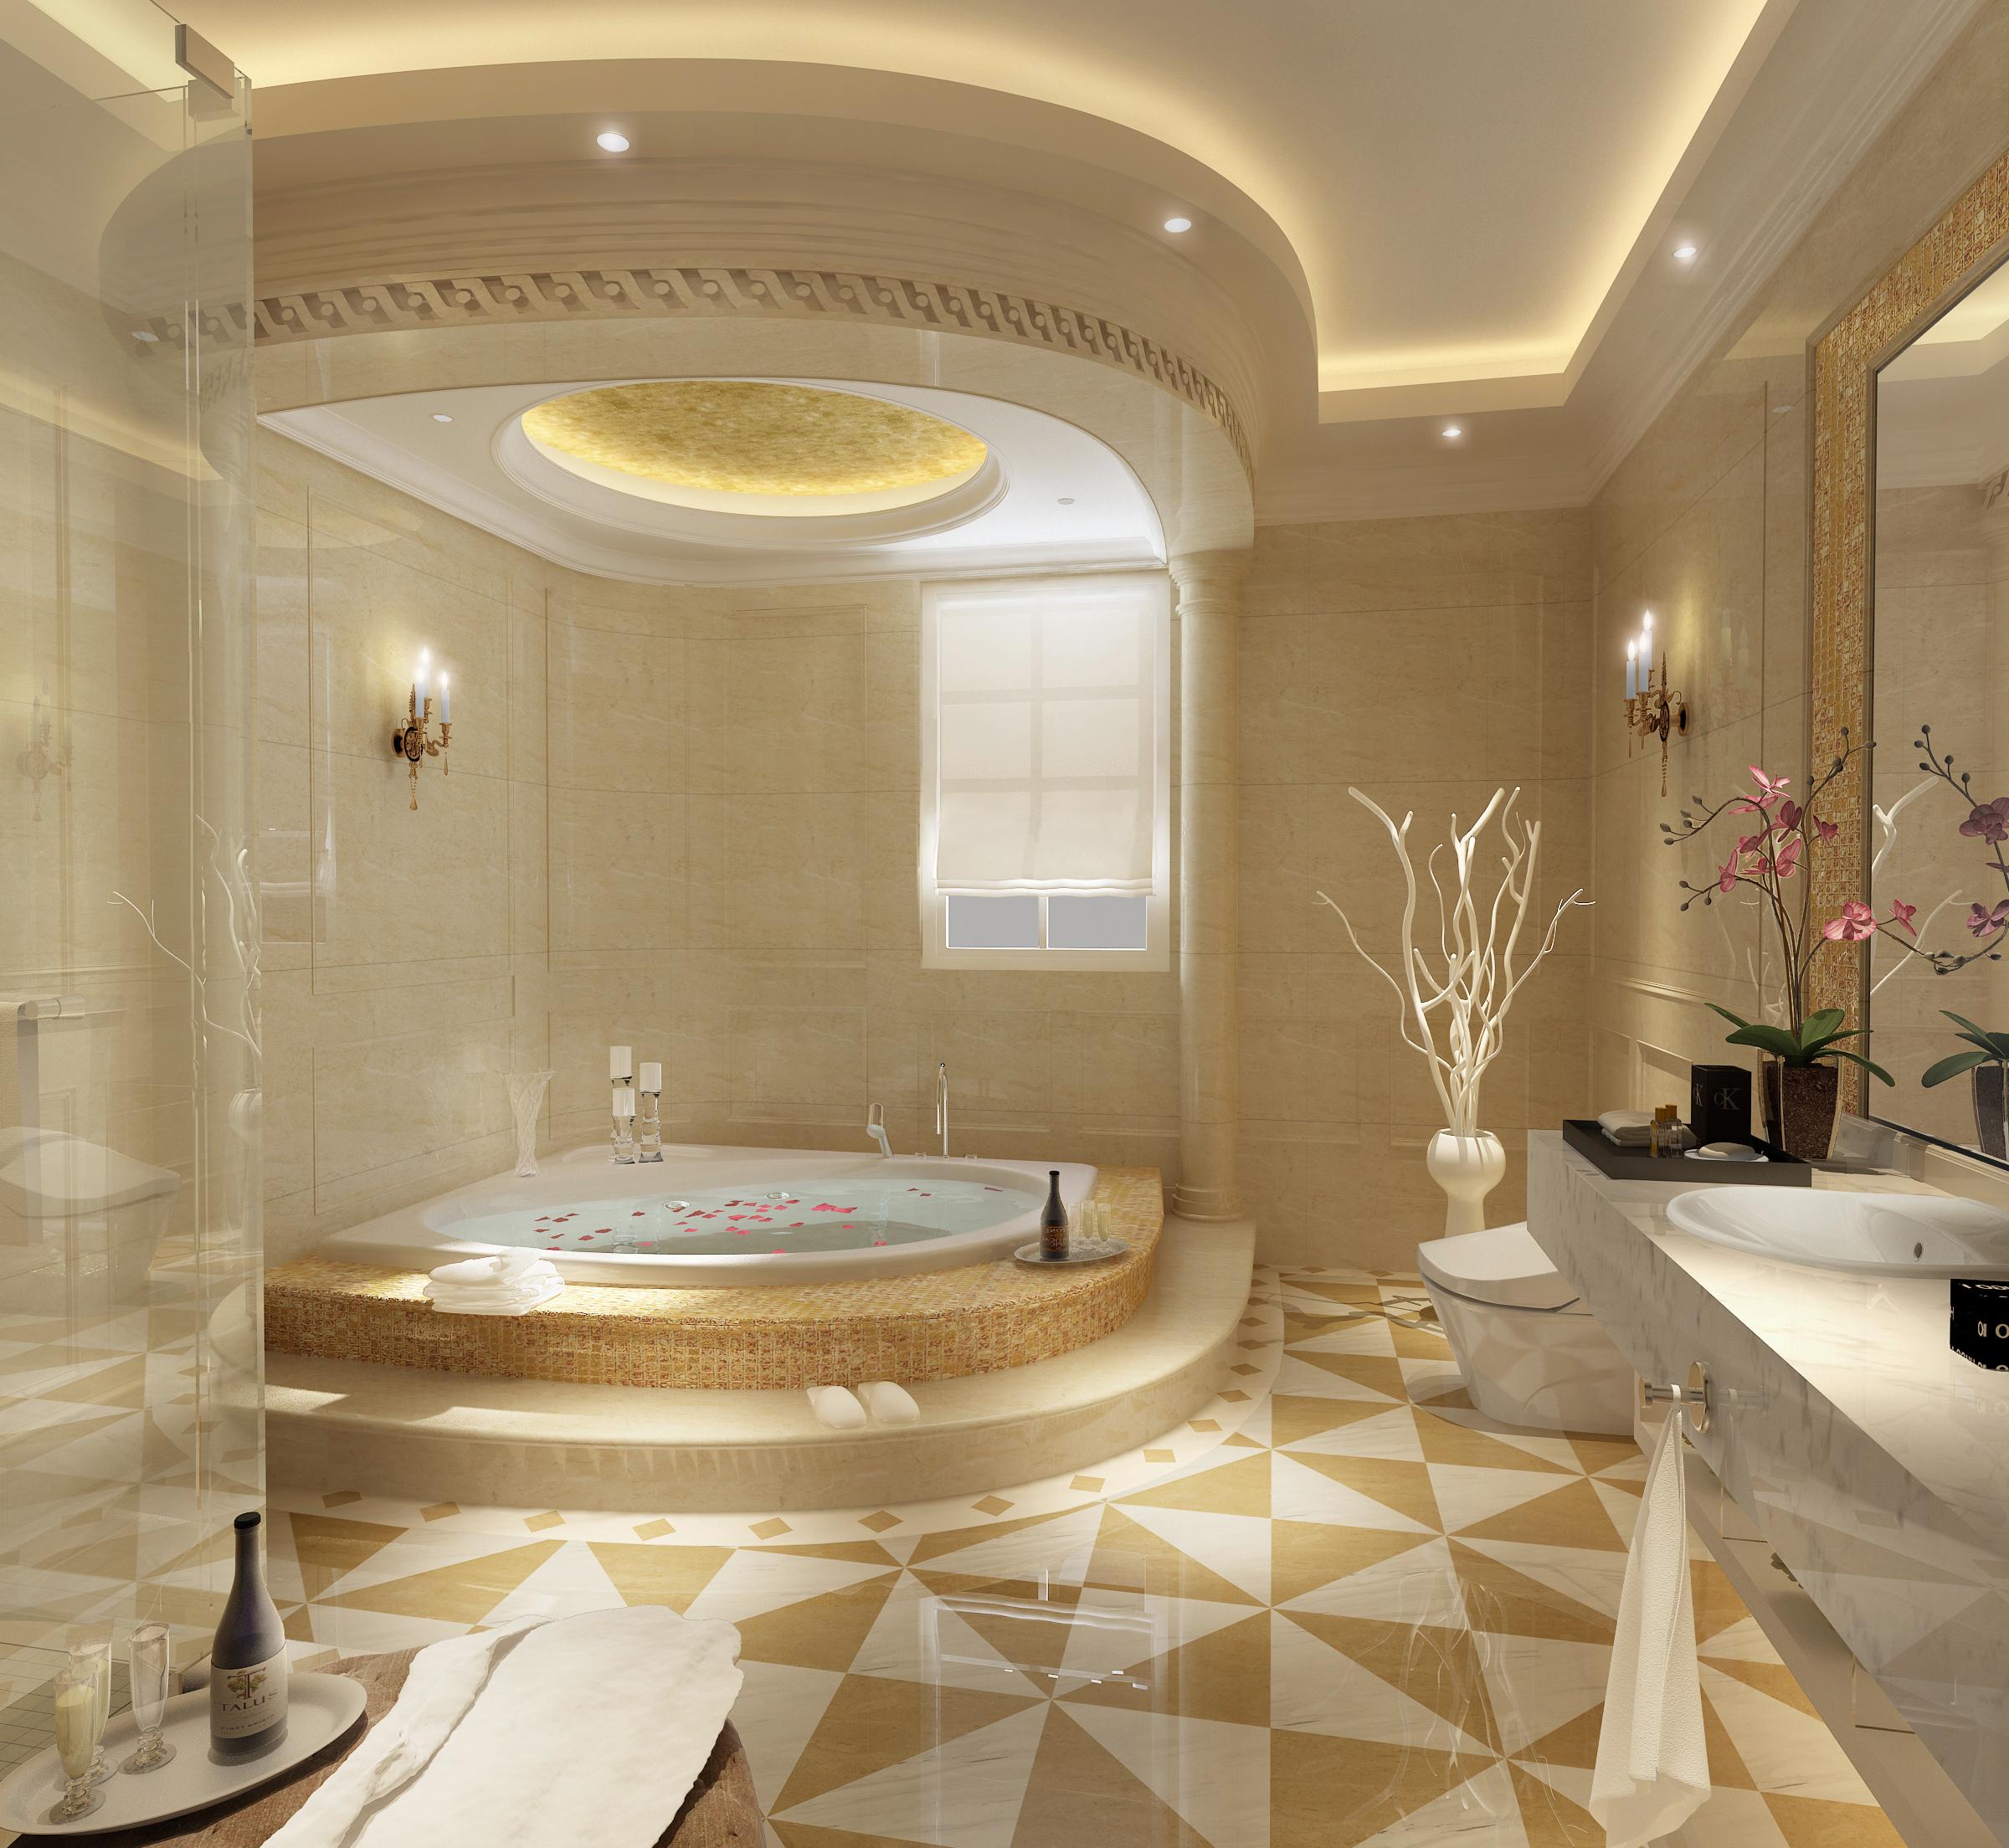 Luxurious Bathroom With Big Bath 3D Model .max - CGTrader.com on Bathroom Models  id=70279